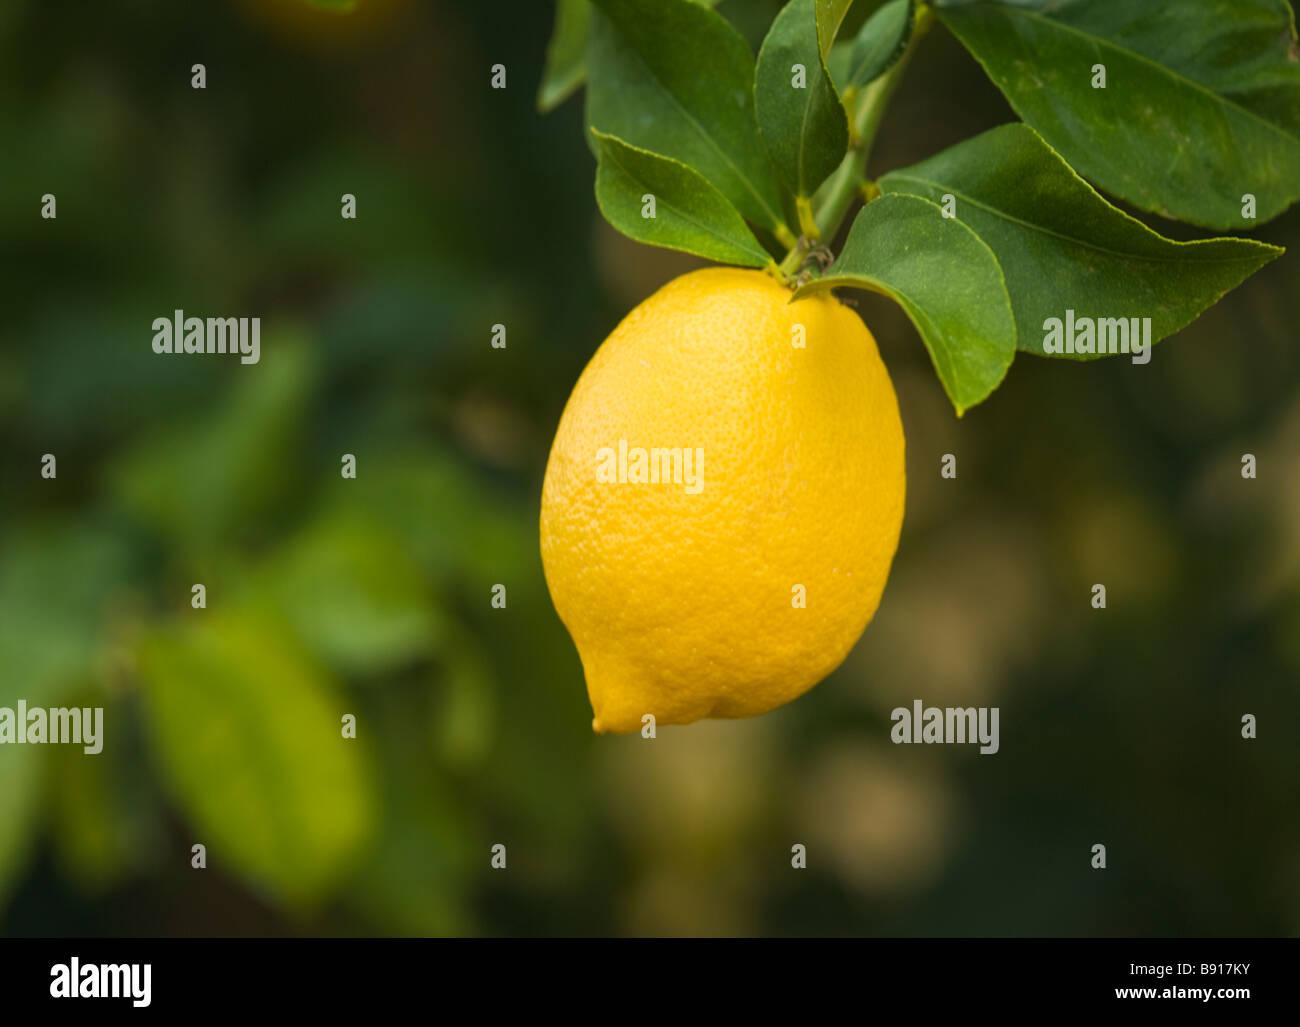 "Zitrone ""Lissabon"" Vielfalt auf Ast hängen. Stockbild"